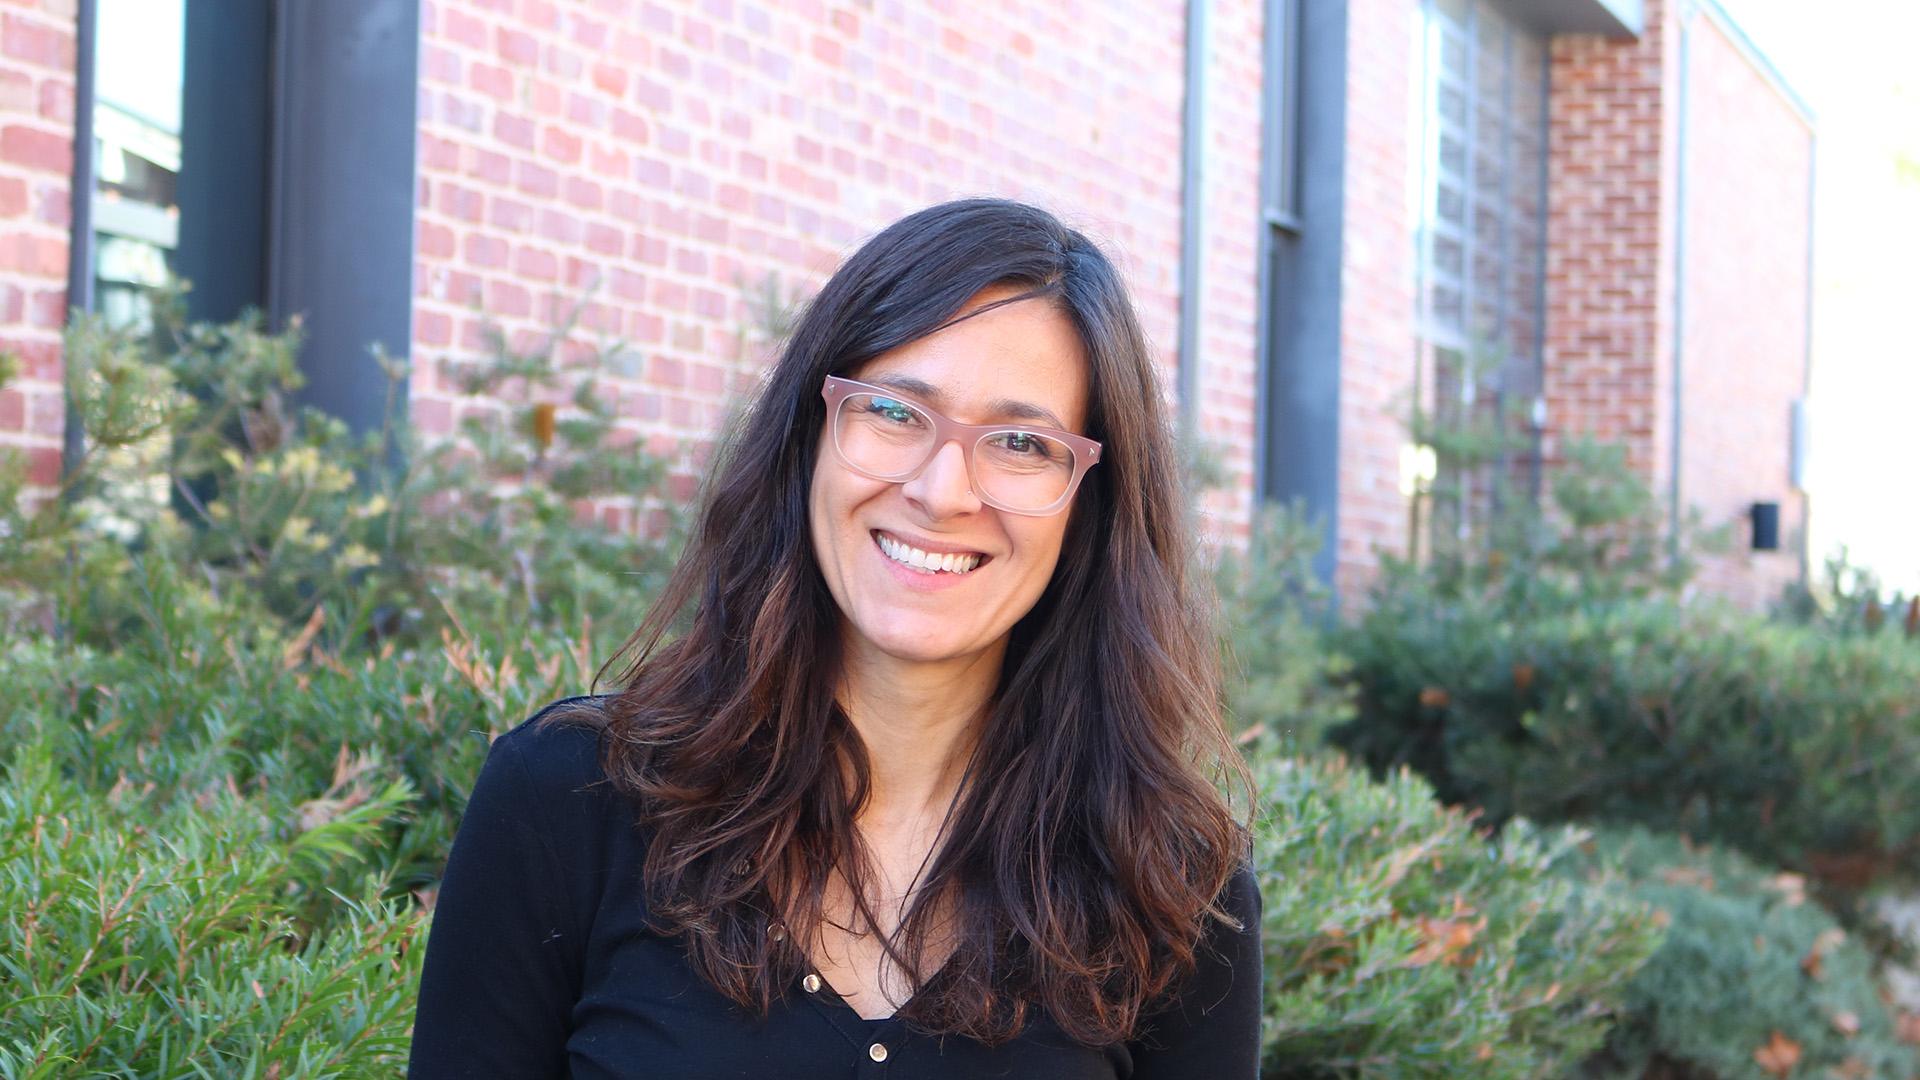 Associate Professor Marta Hernandez-Jover